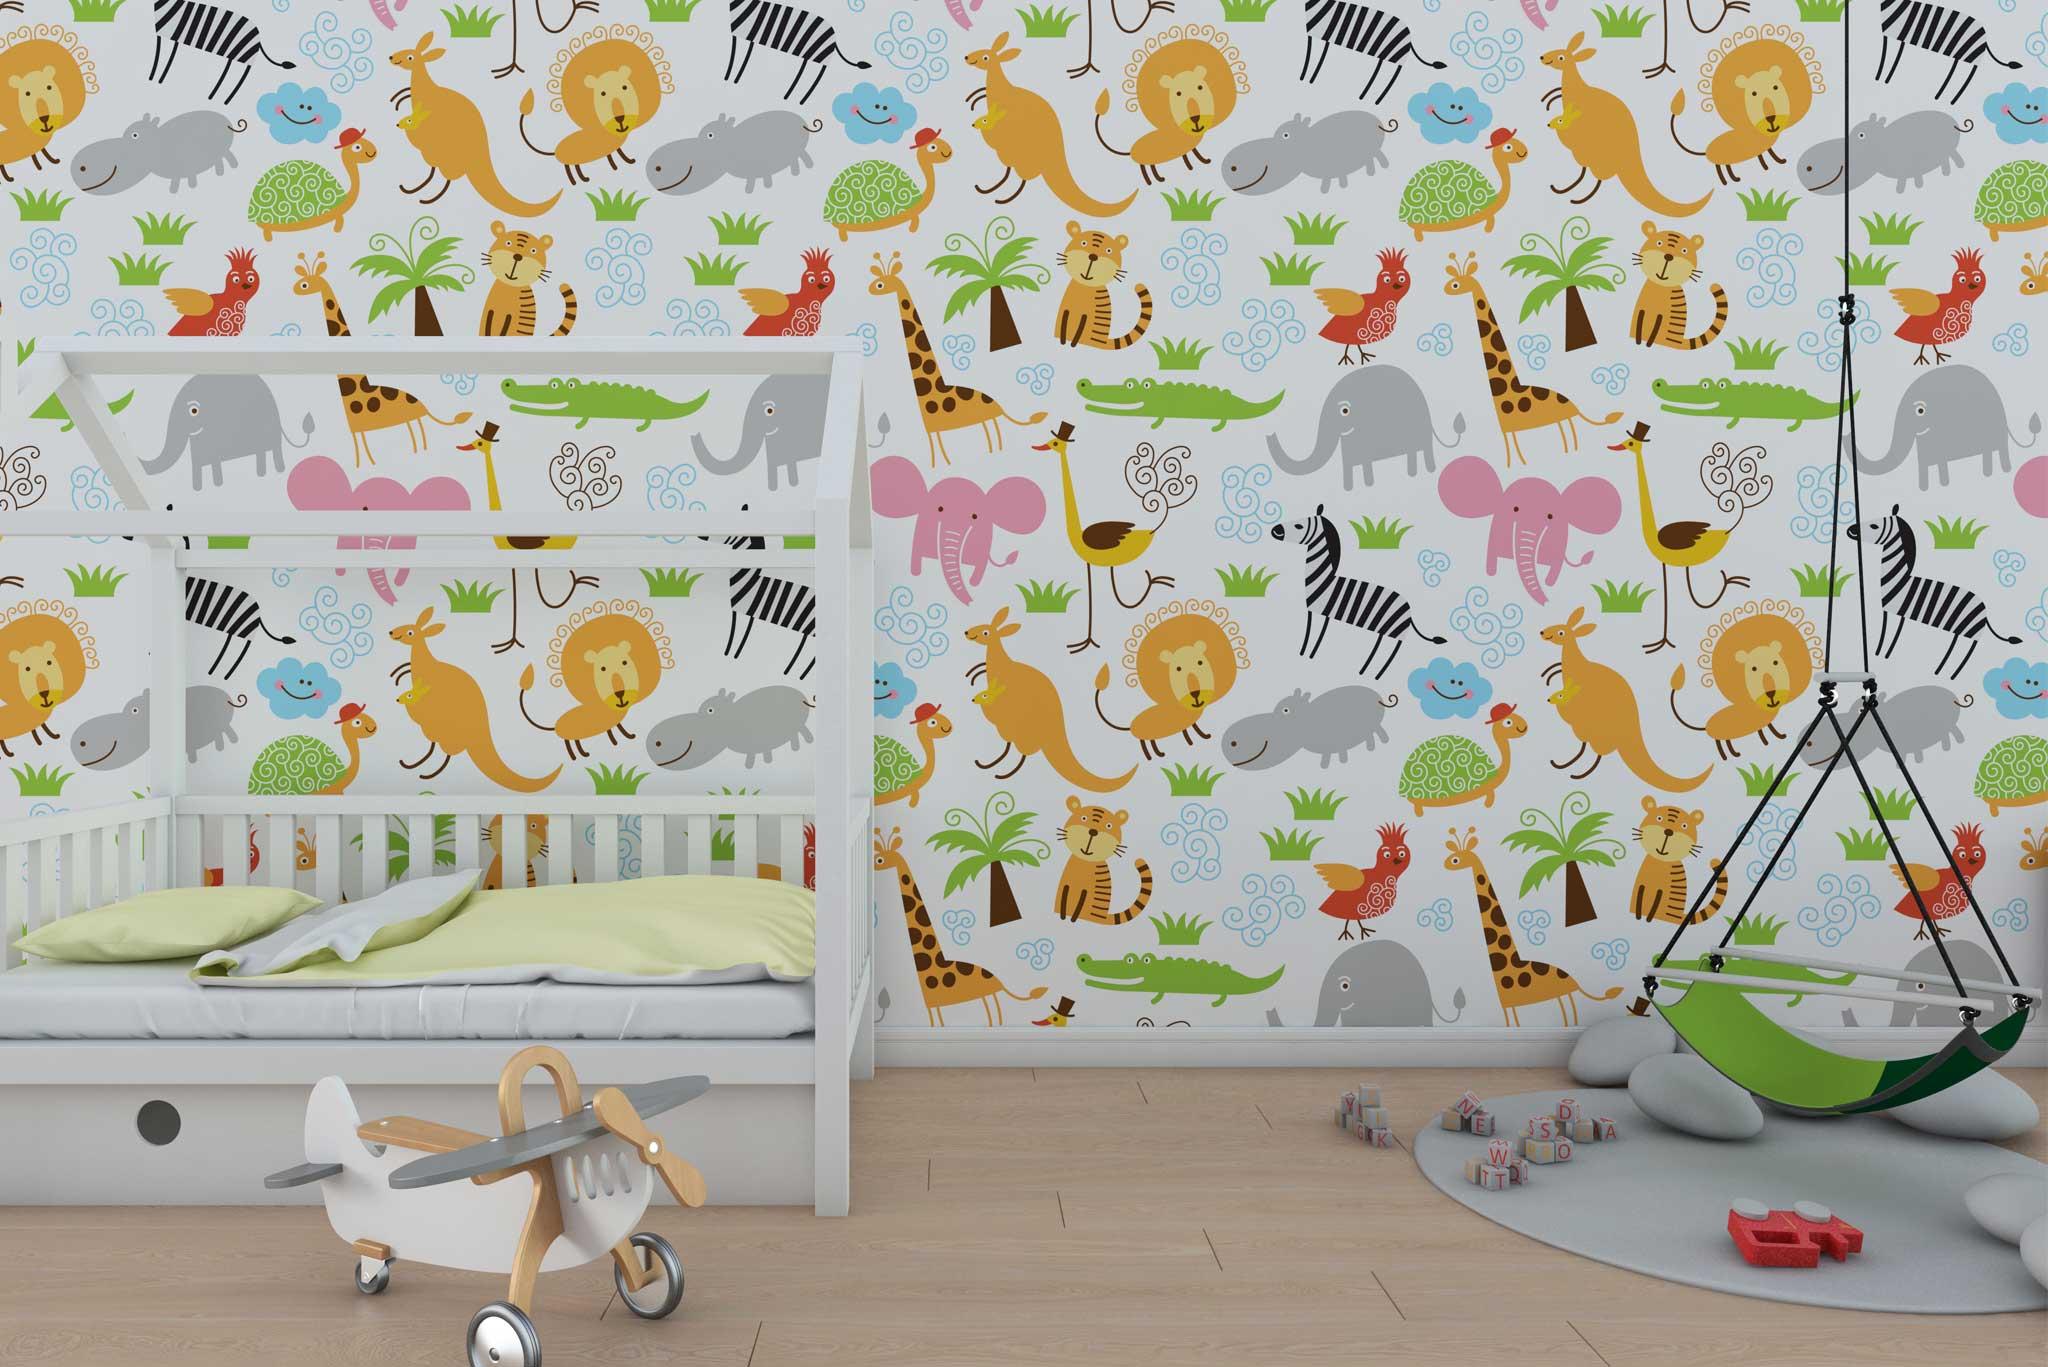 http://daringprints.ro/wp-content/uploads/2020/12/tapet-fototapet-personalizat-comanda-bucuresti-special-copii-camera-dormitor-perete-animale-jungla-safari-vesel-desene.jpg